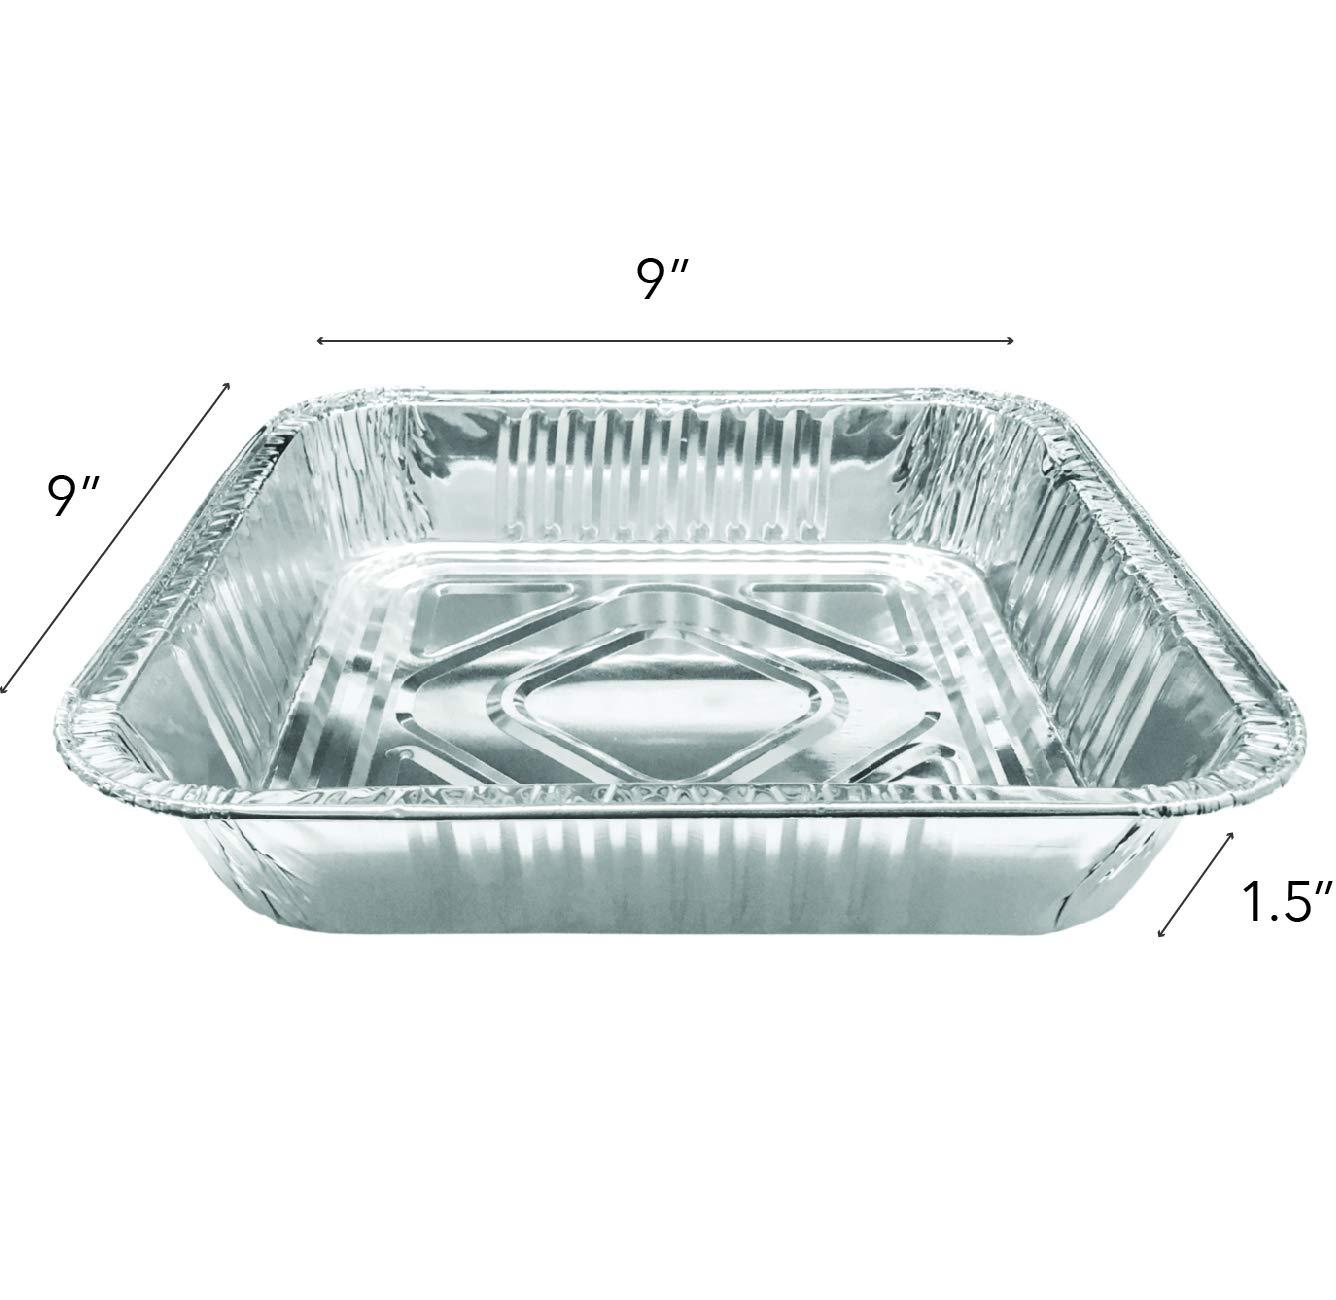 9x9 Aluminum Baking Pans (30 Pack) Square Baking Pans - 9 Inch Cake Pan - Brownie Pan - Lasagna Pan - 9'' x 9'' x 2'' by Stock Your Home (Image #1)